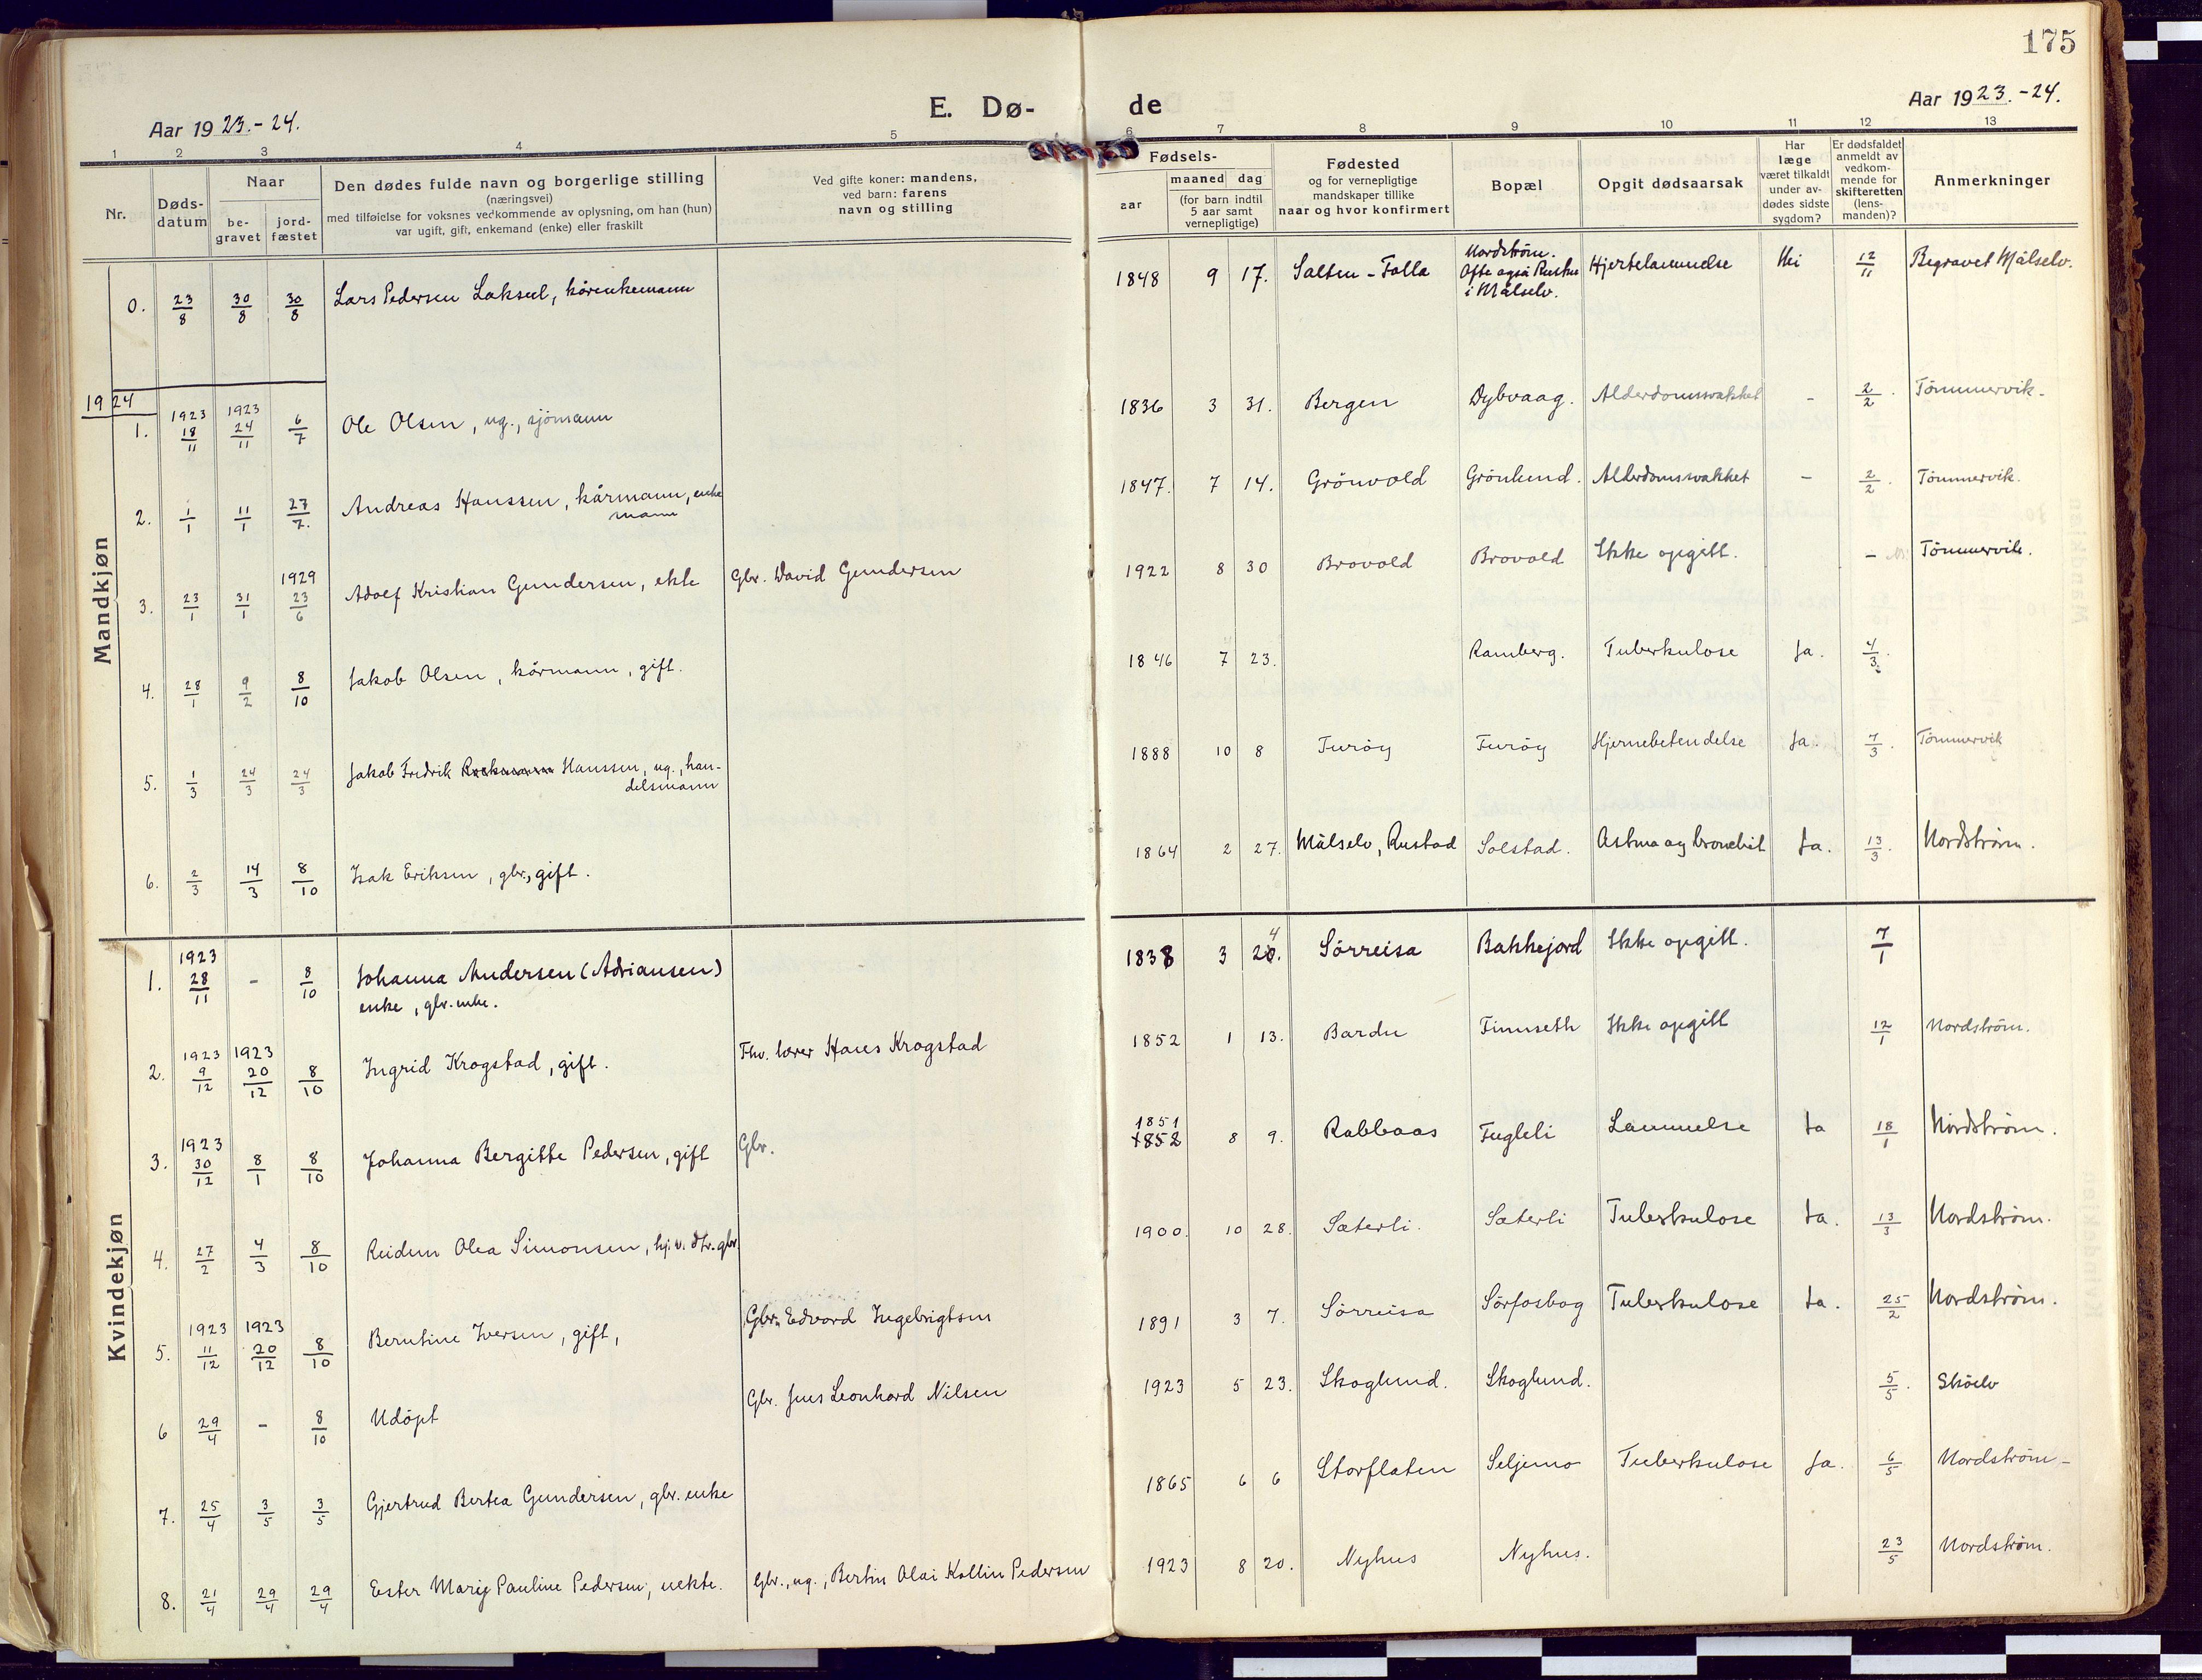 SATØ, Tranøy sokneprestkontor, I/Ia/Iaa/L0015kirke: Ministerialbok nr. 15, 1919-1928, s. 175